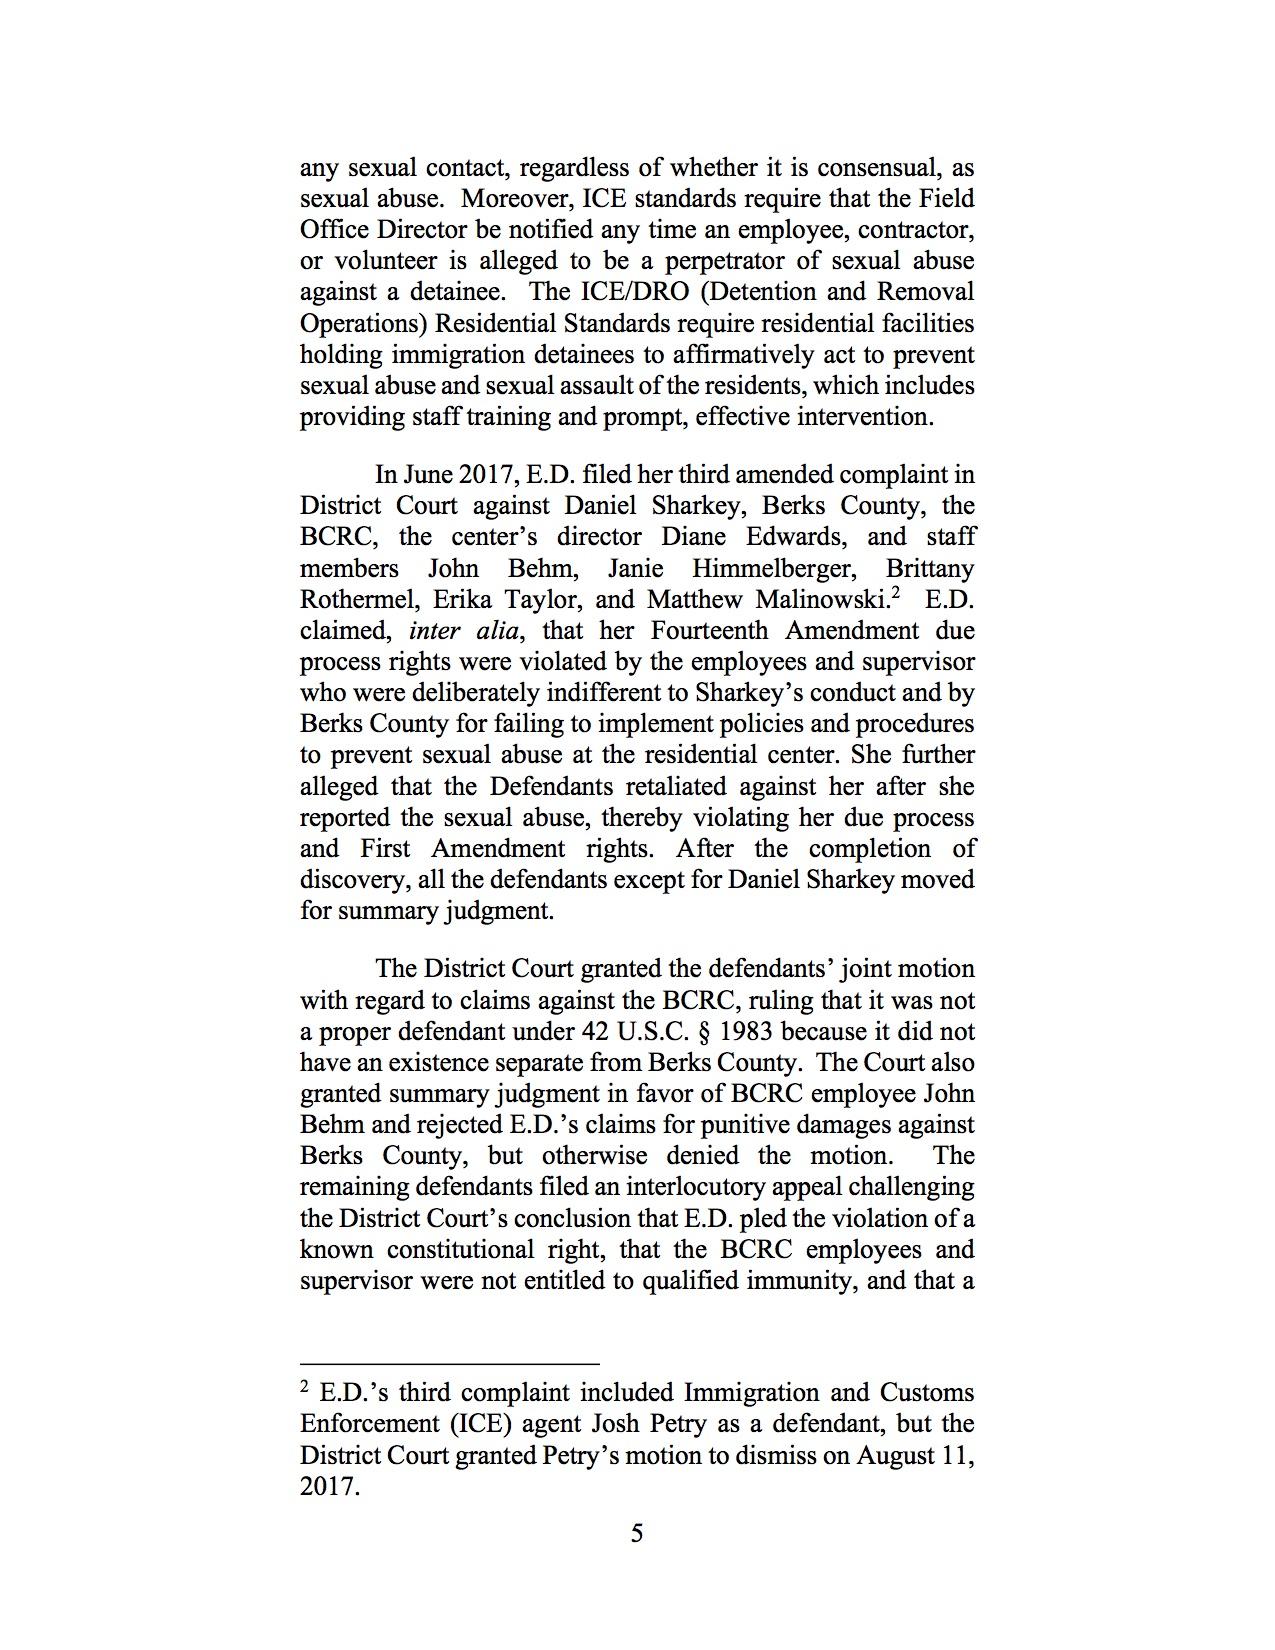 E.D. v. Sharkey 3rd Circuit Opinion.5.jpg